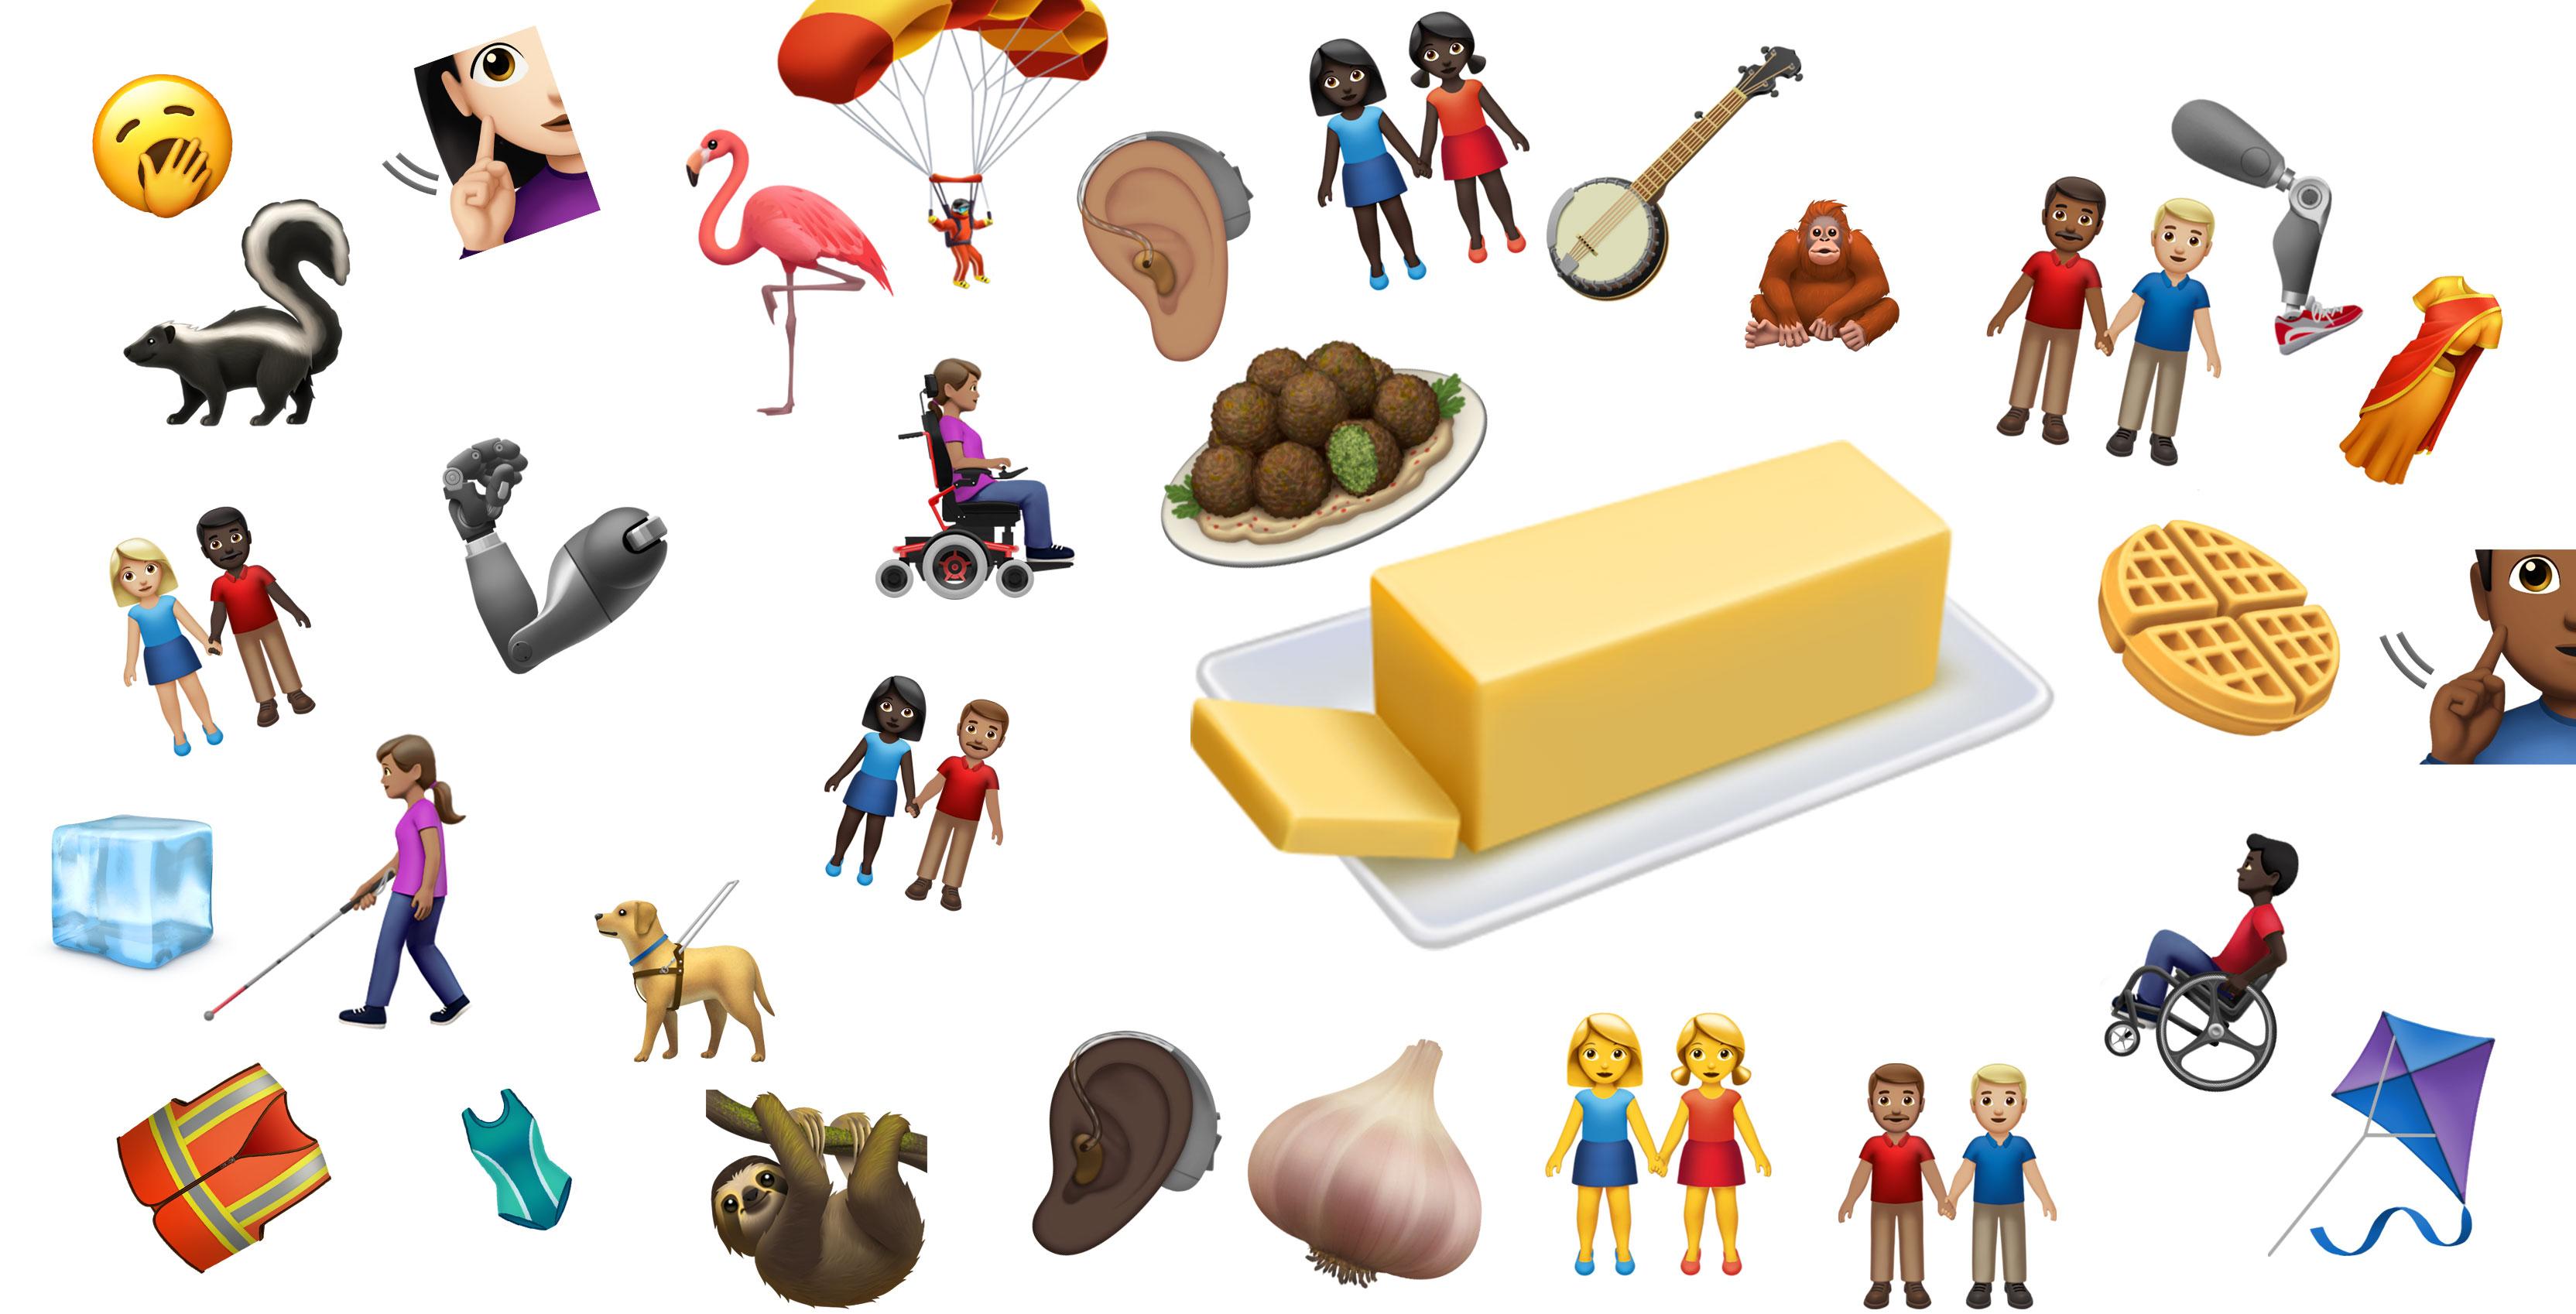 Apple shows off new iOS 13 emoji in in celebration of World Emoji Day